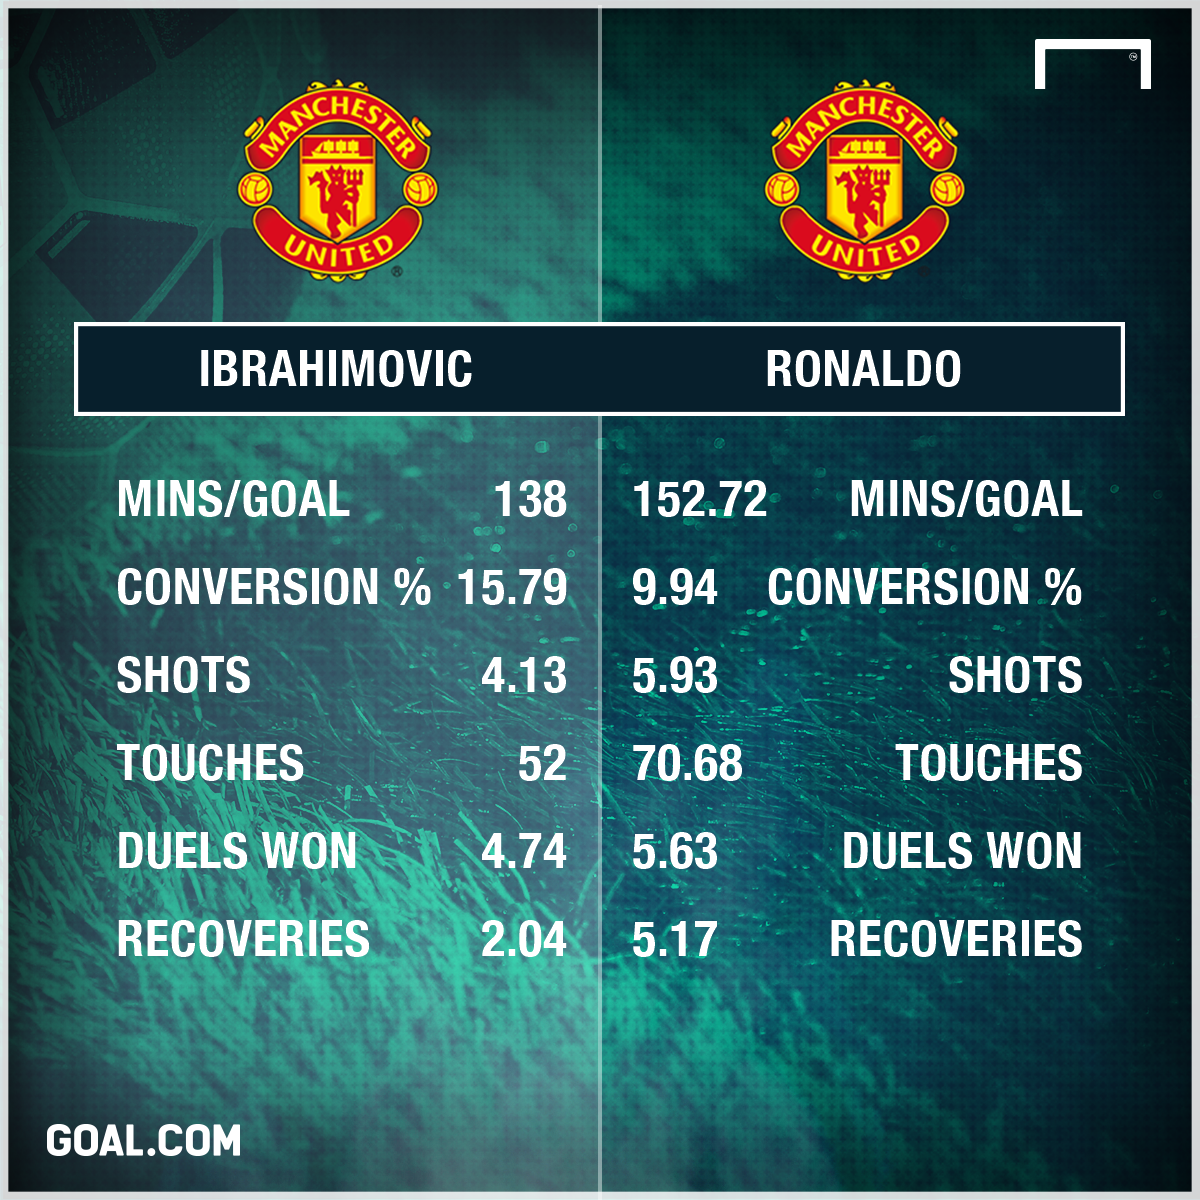 Zlatan Ibrahimovic Cristiano Ronaldo Manchester United